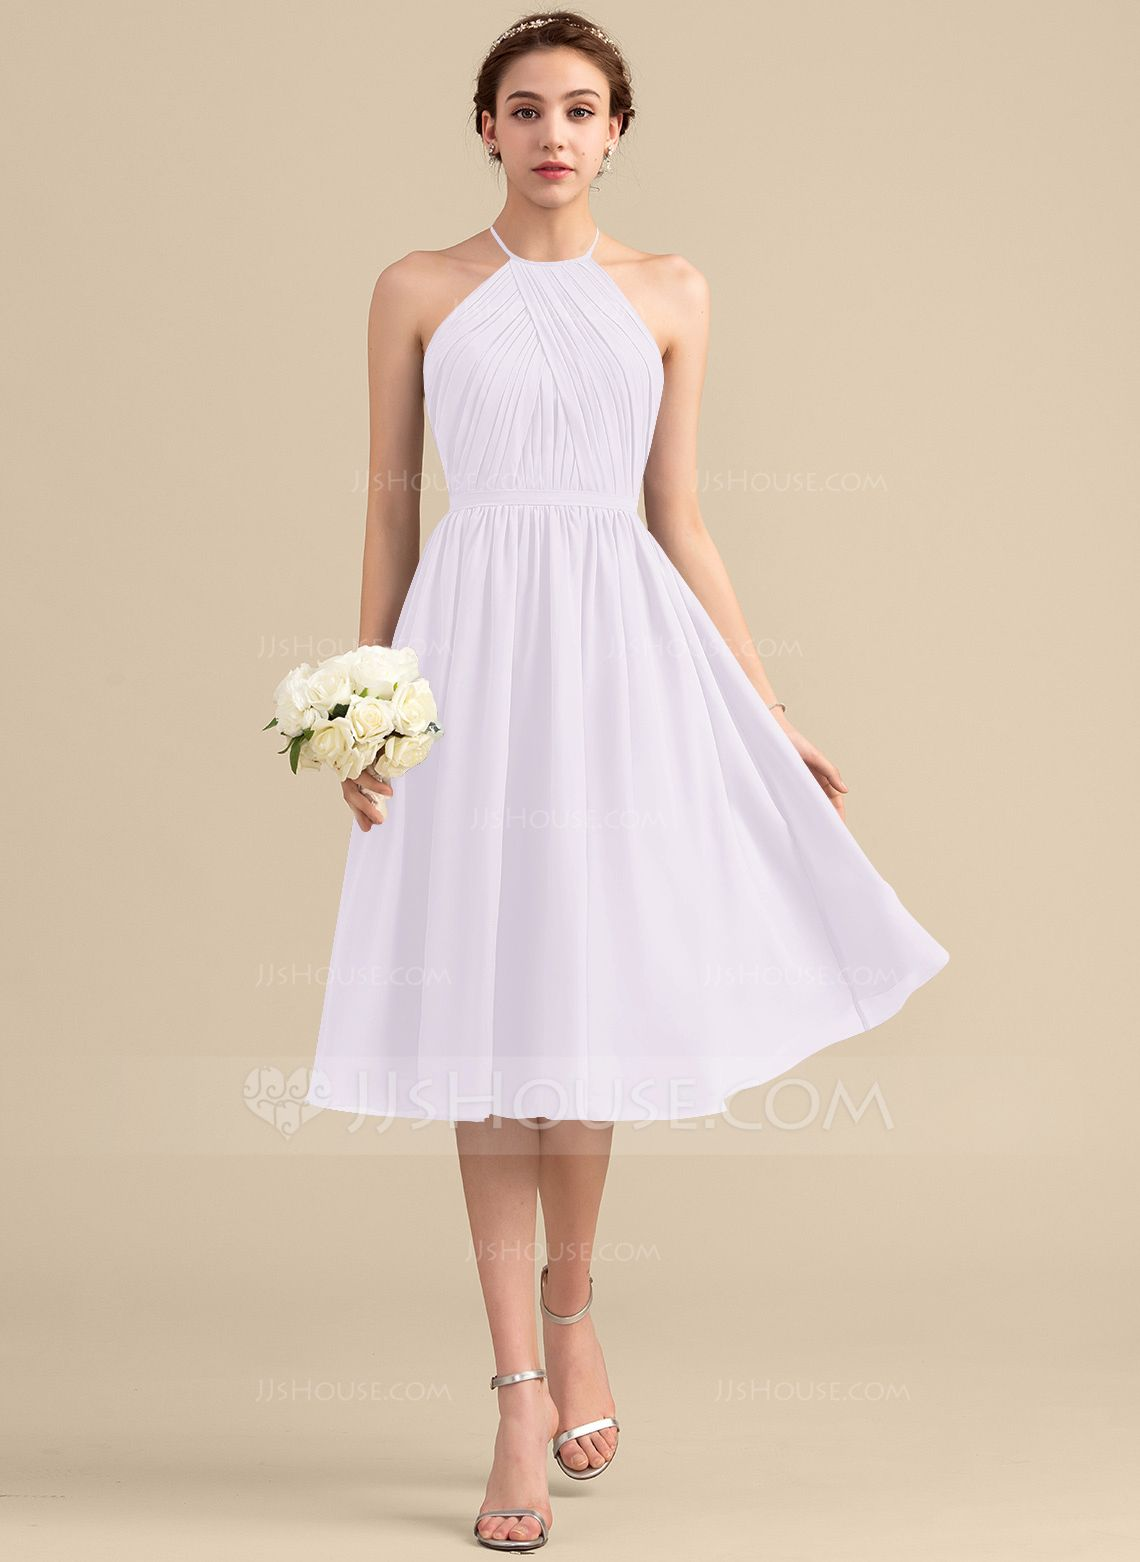 351c0c24680c A-Line/Princess Scoop Neck Knee-Length Chiffon Bridesmaid Dress With Ruffle  (007153362) - Bridesmaid Dresses - JJsHouse